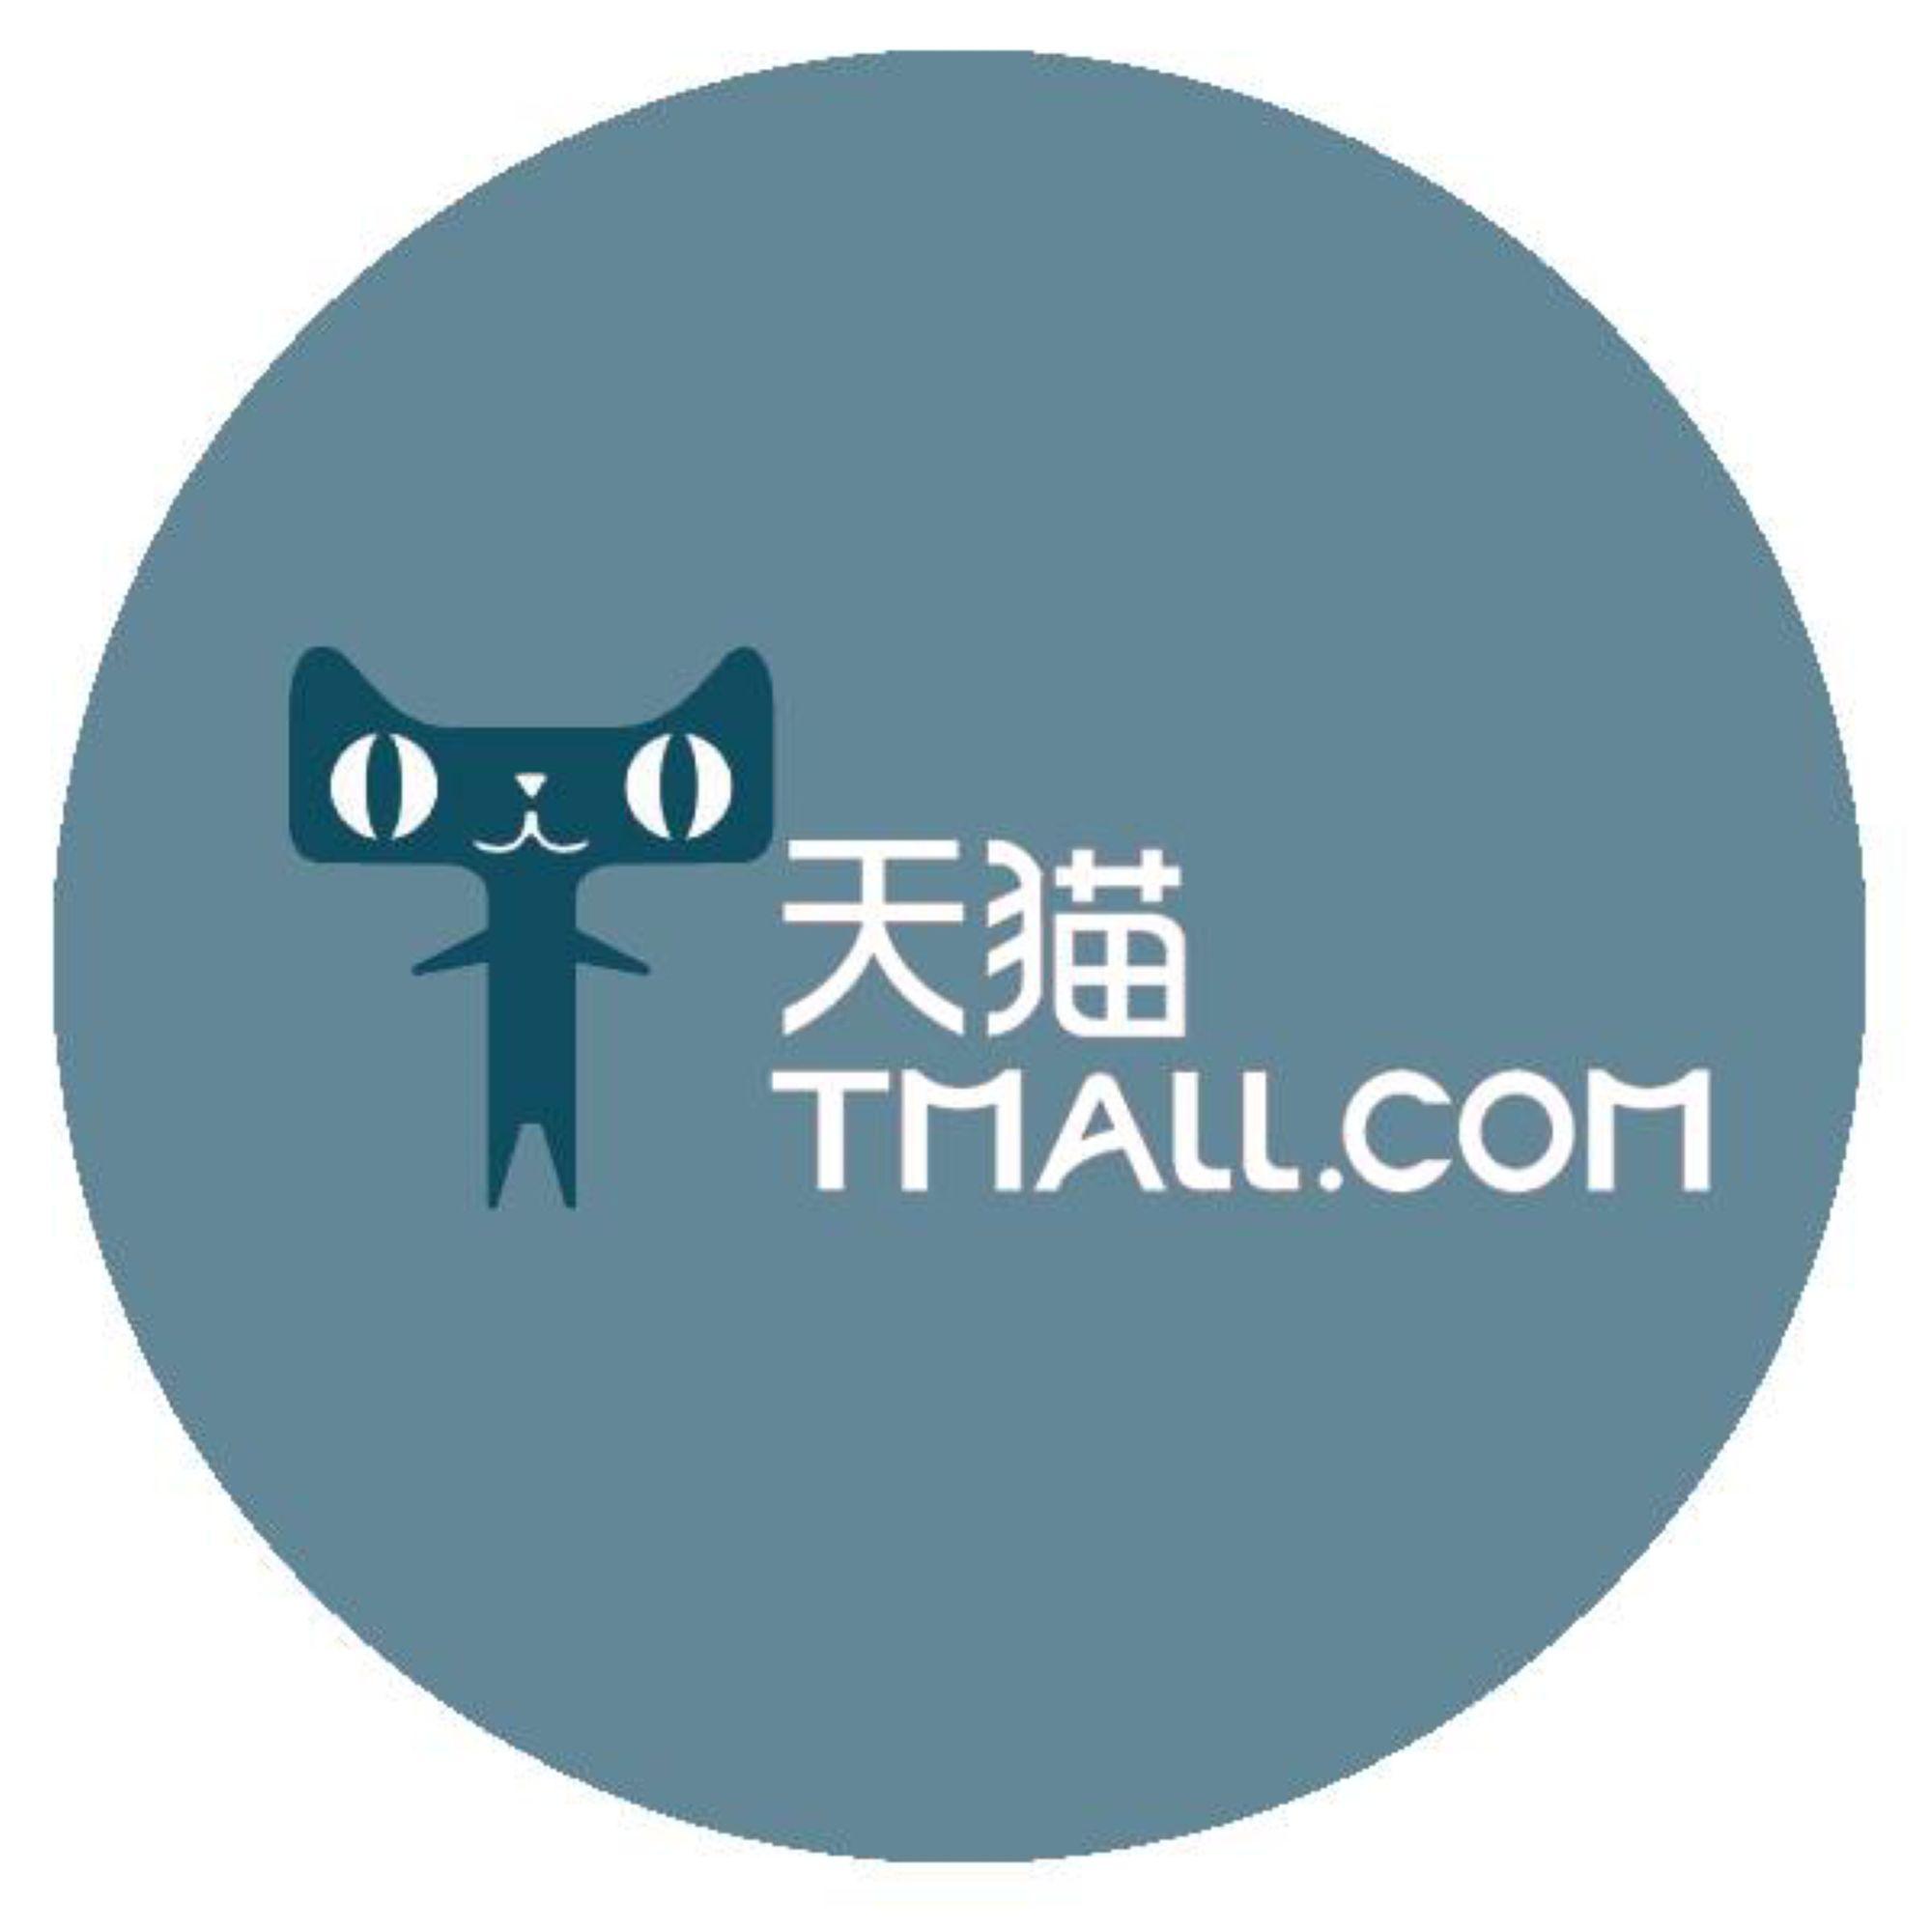 cn_E-commerce_campaign_1212-tmall_600x600.png